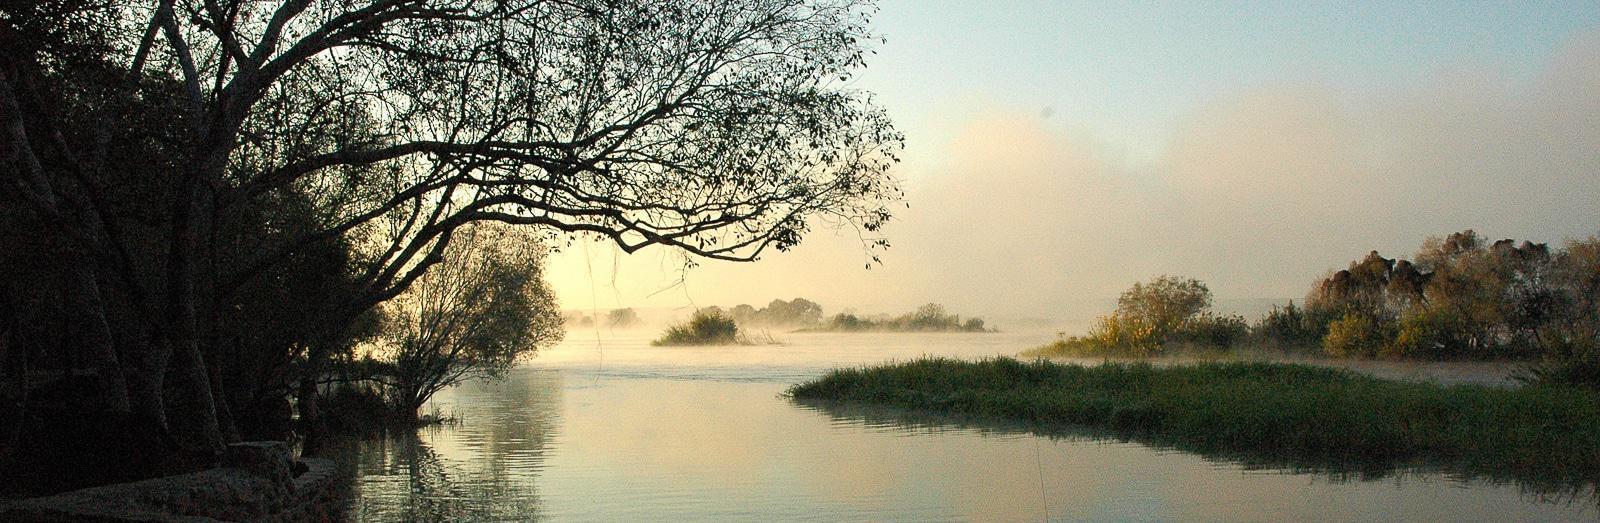 islands-of-siankaba sunrise